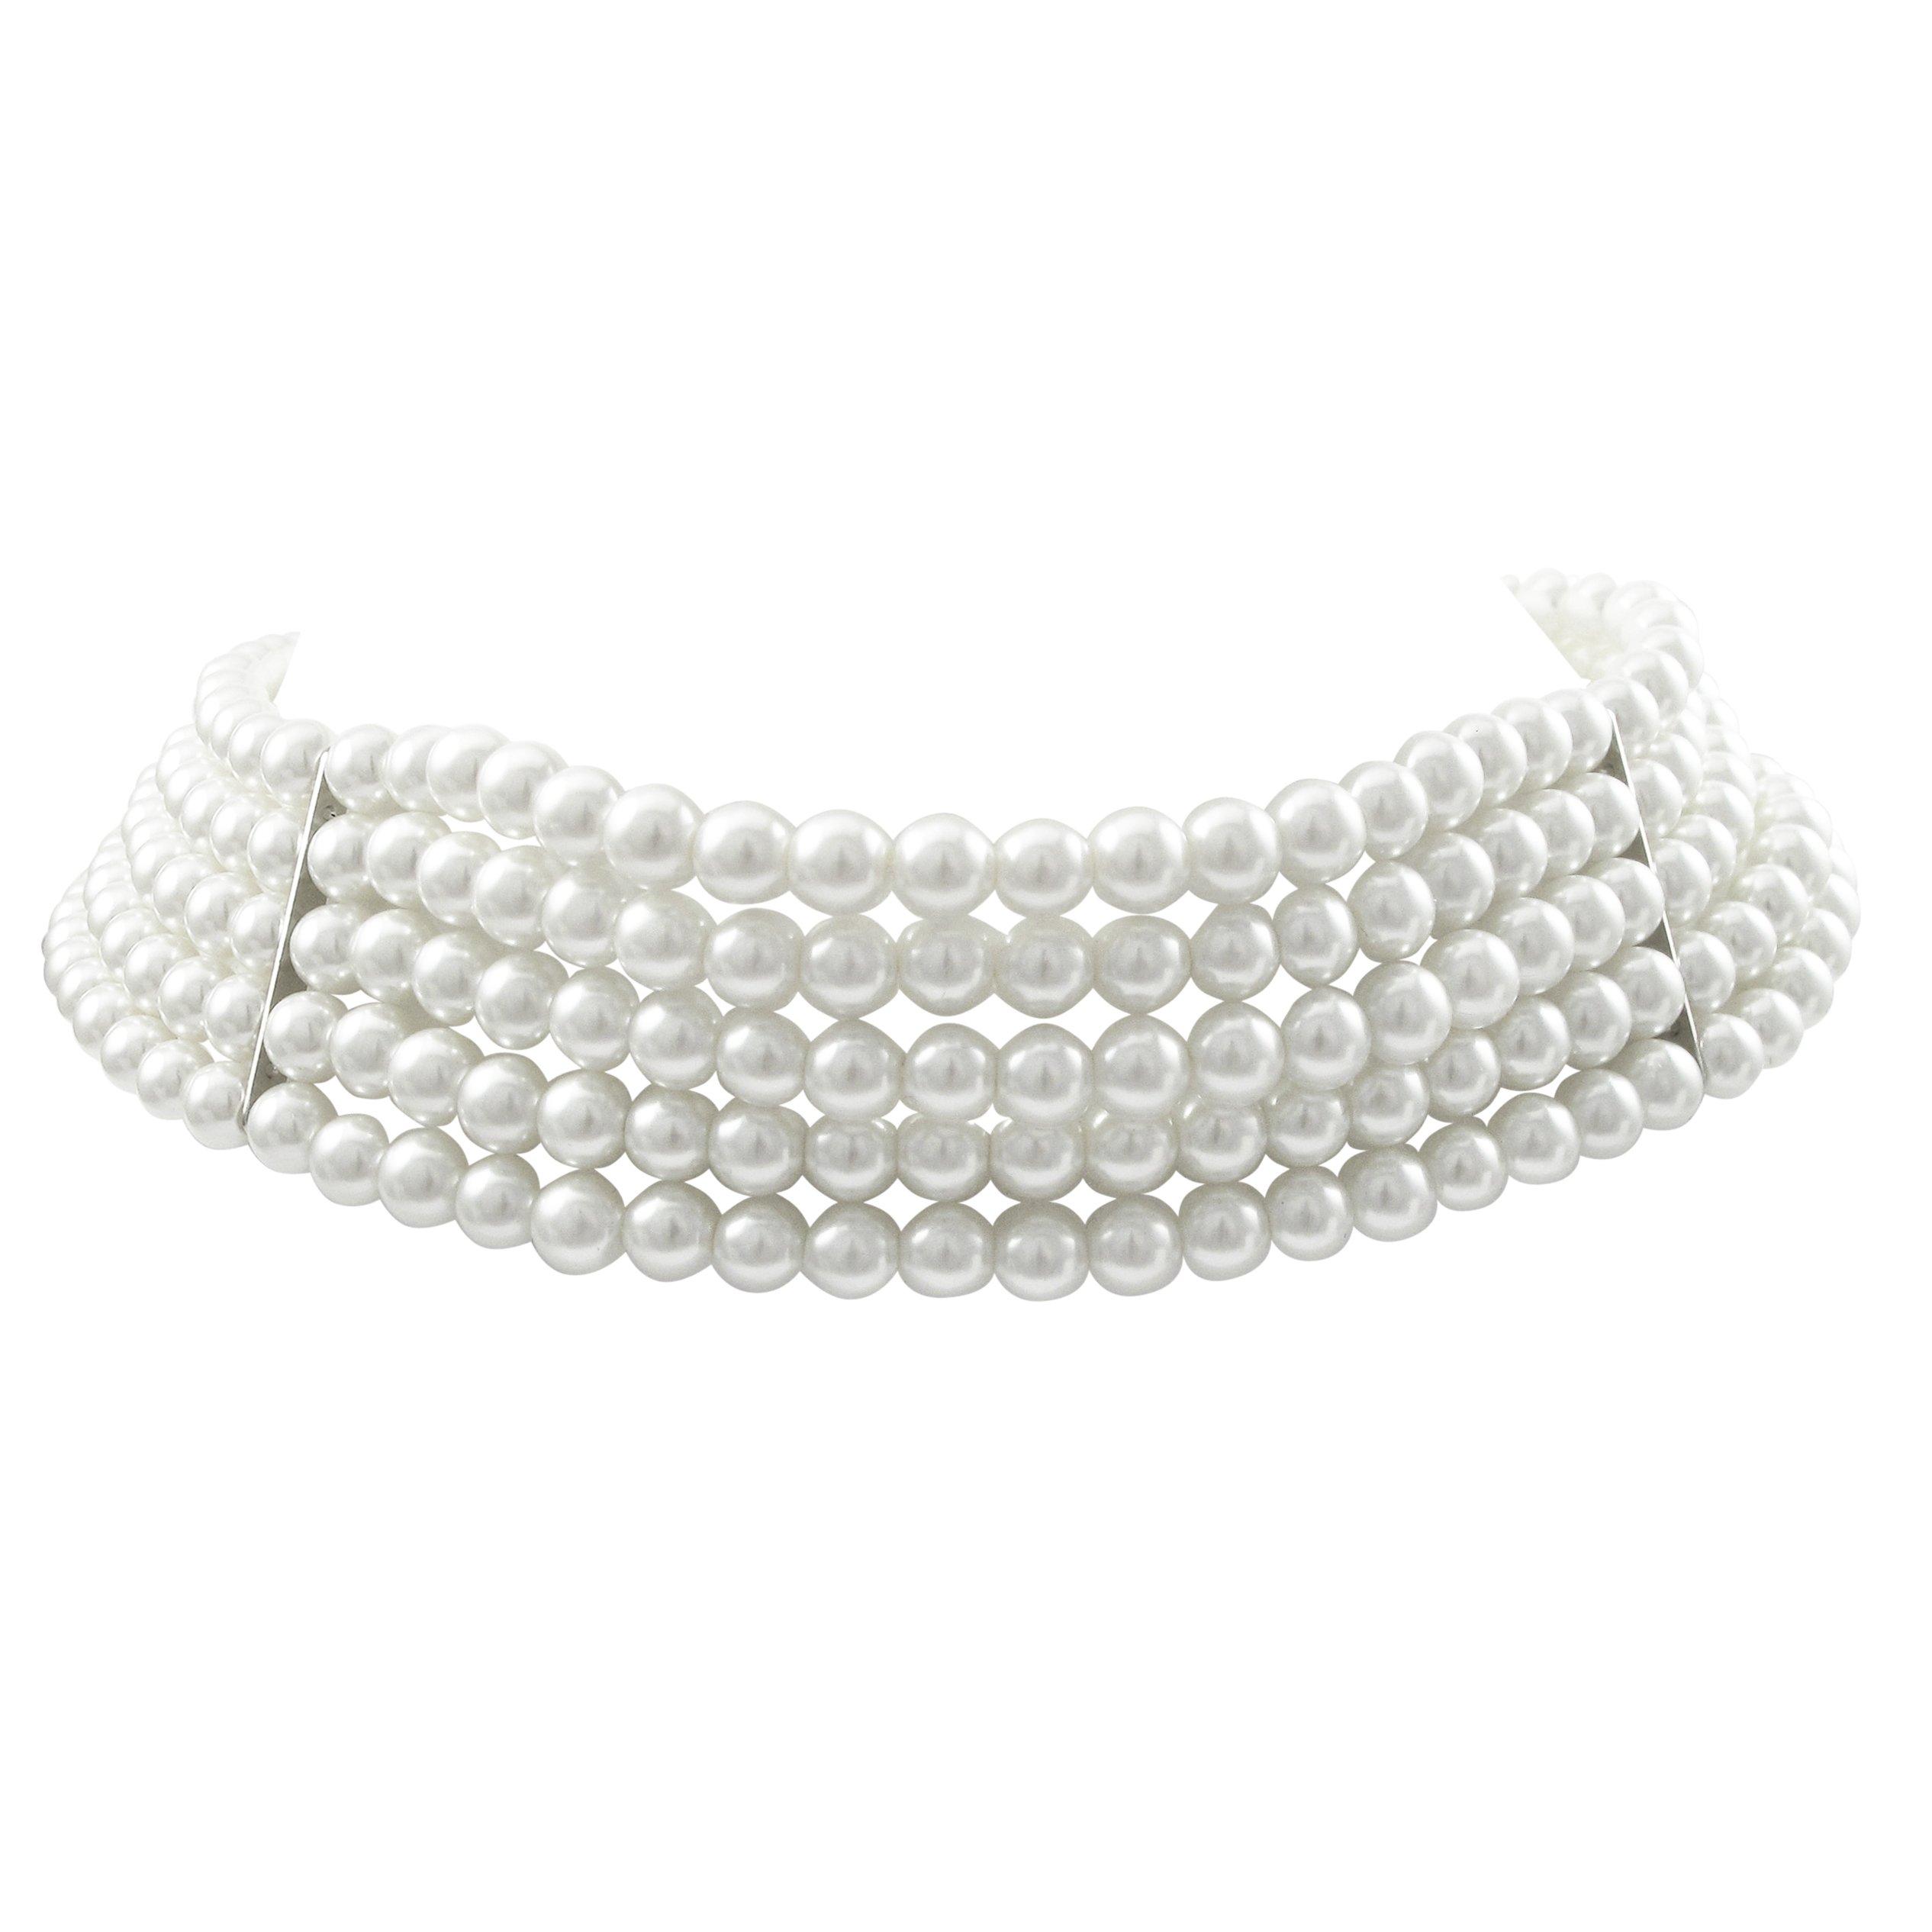 Isaac Kieran Rhodium Finish 6-mm White Faux Pearl 5-Strand Choker Necklace, 13+3'' Extender